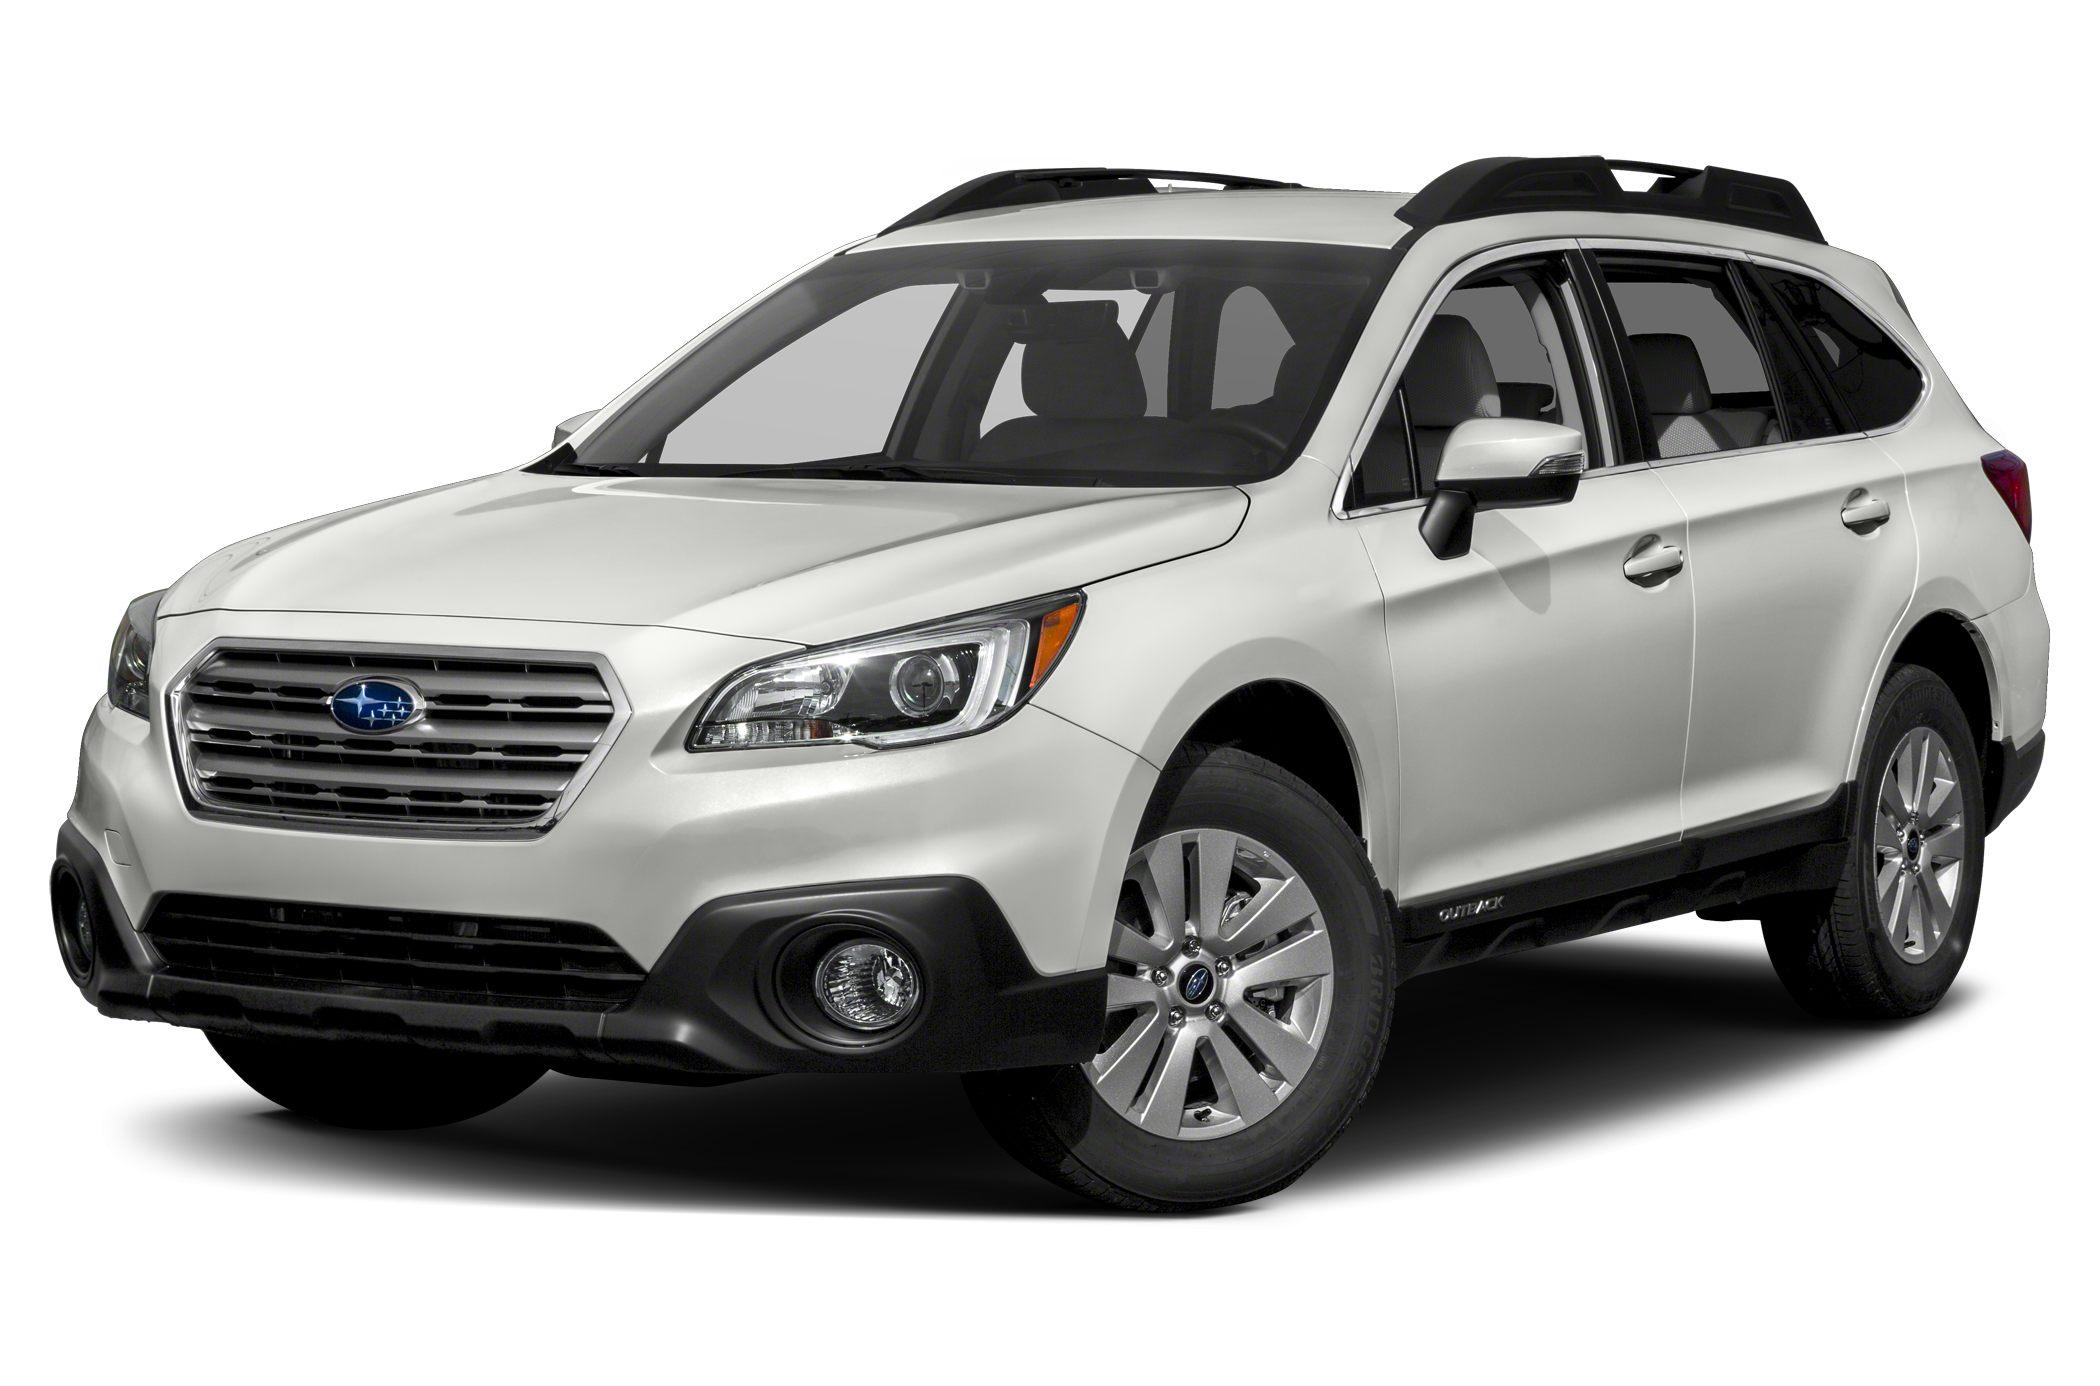 2017 Subaru Outback 25i Premium Miles 5Color Gray Stock 17U213 VIN 4S4BSAHC0H3259276